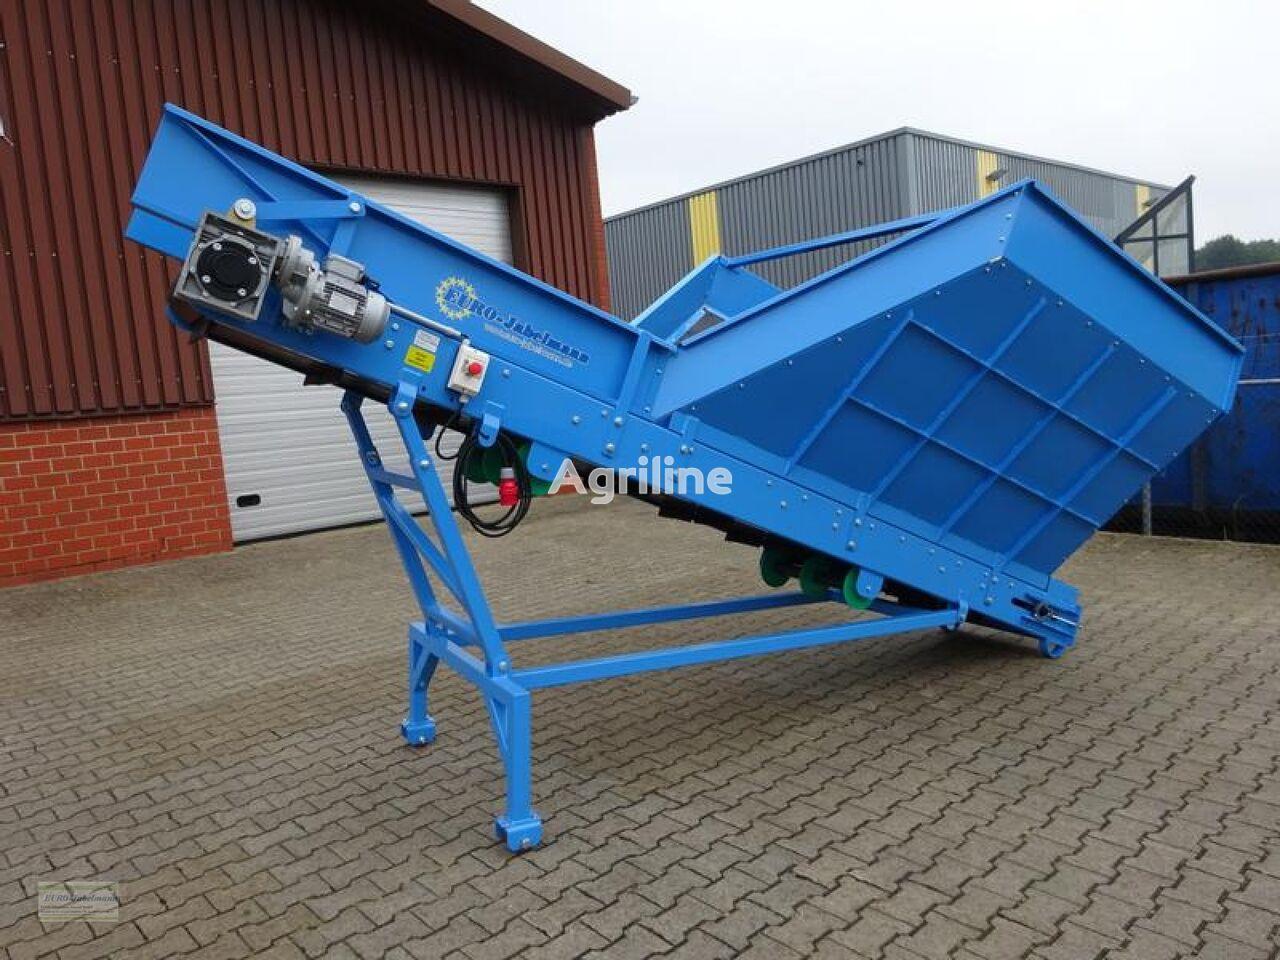 nova Sonstige EURO-Jabelmann Förderband Bunkerband Sonderanfertigung, punilica kontejnera